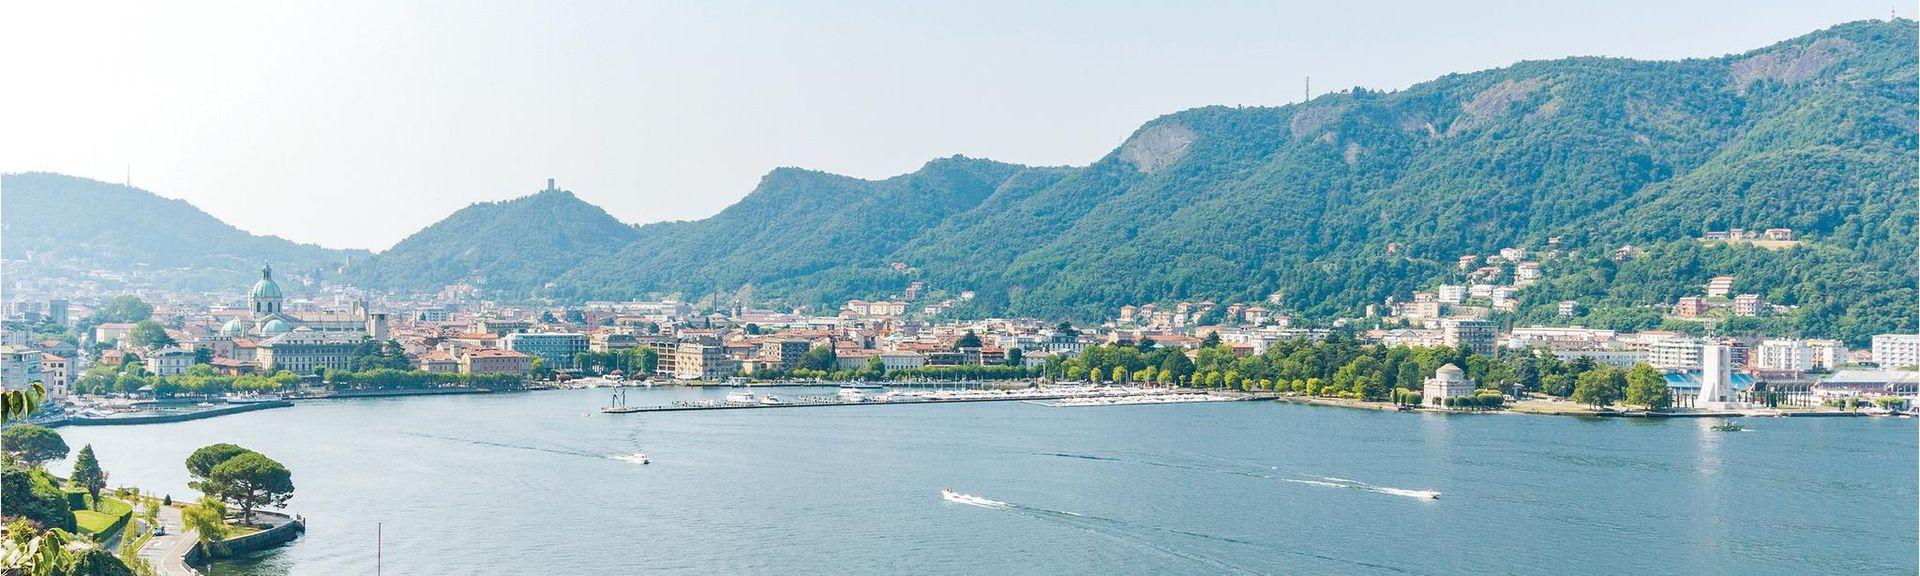 Gallarate, Lombardy, Italy